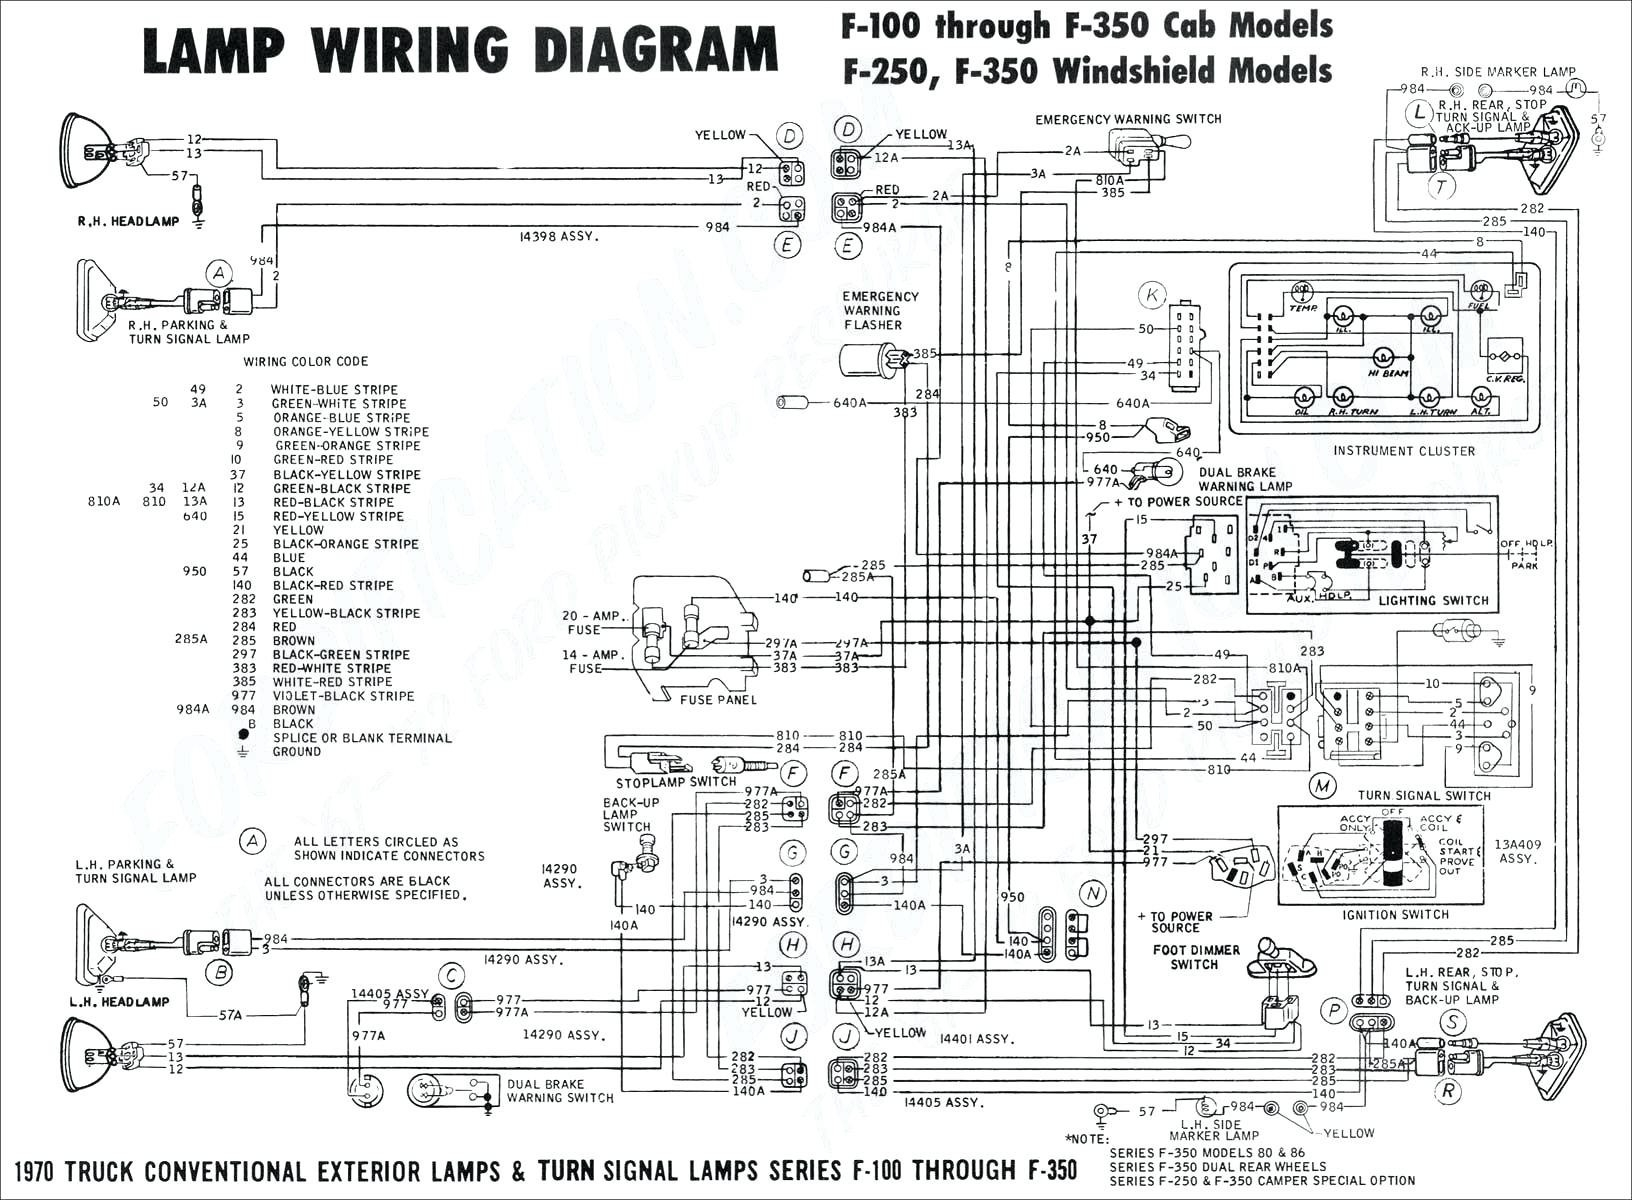 [DIAGRAM] 1951 Ford Turn Signal Wiring Diagram FULL